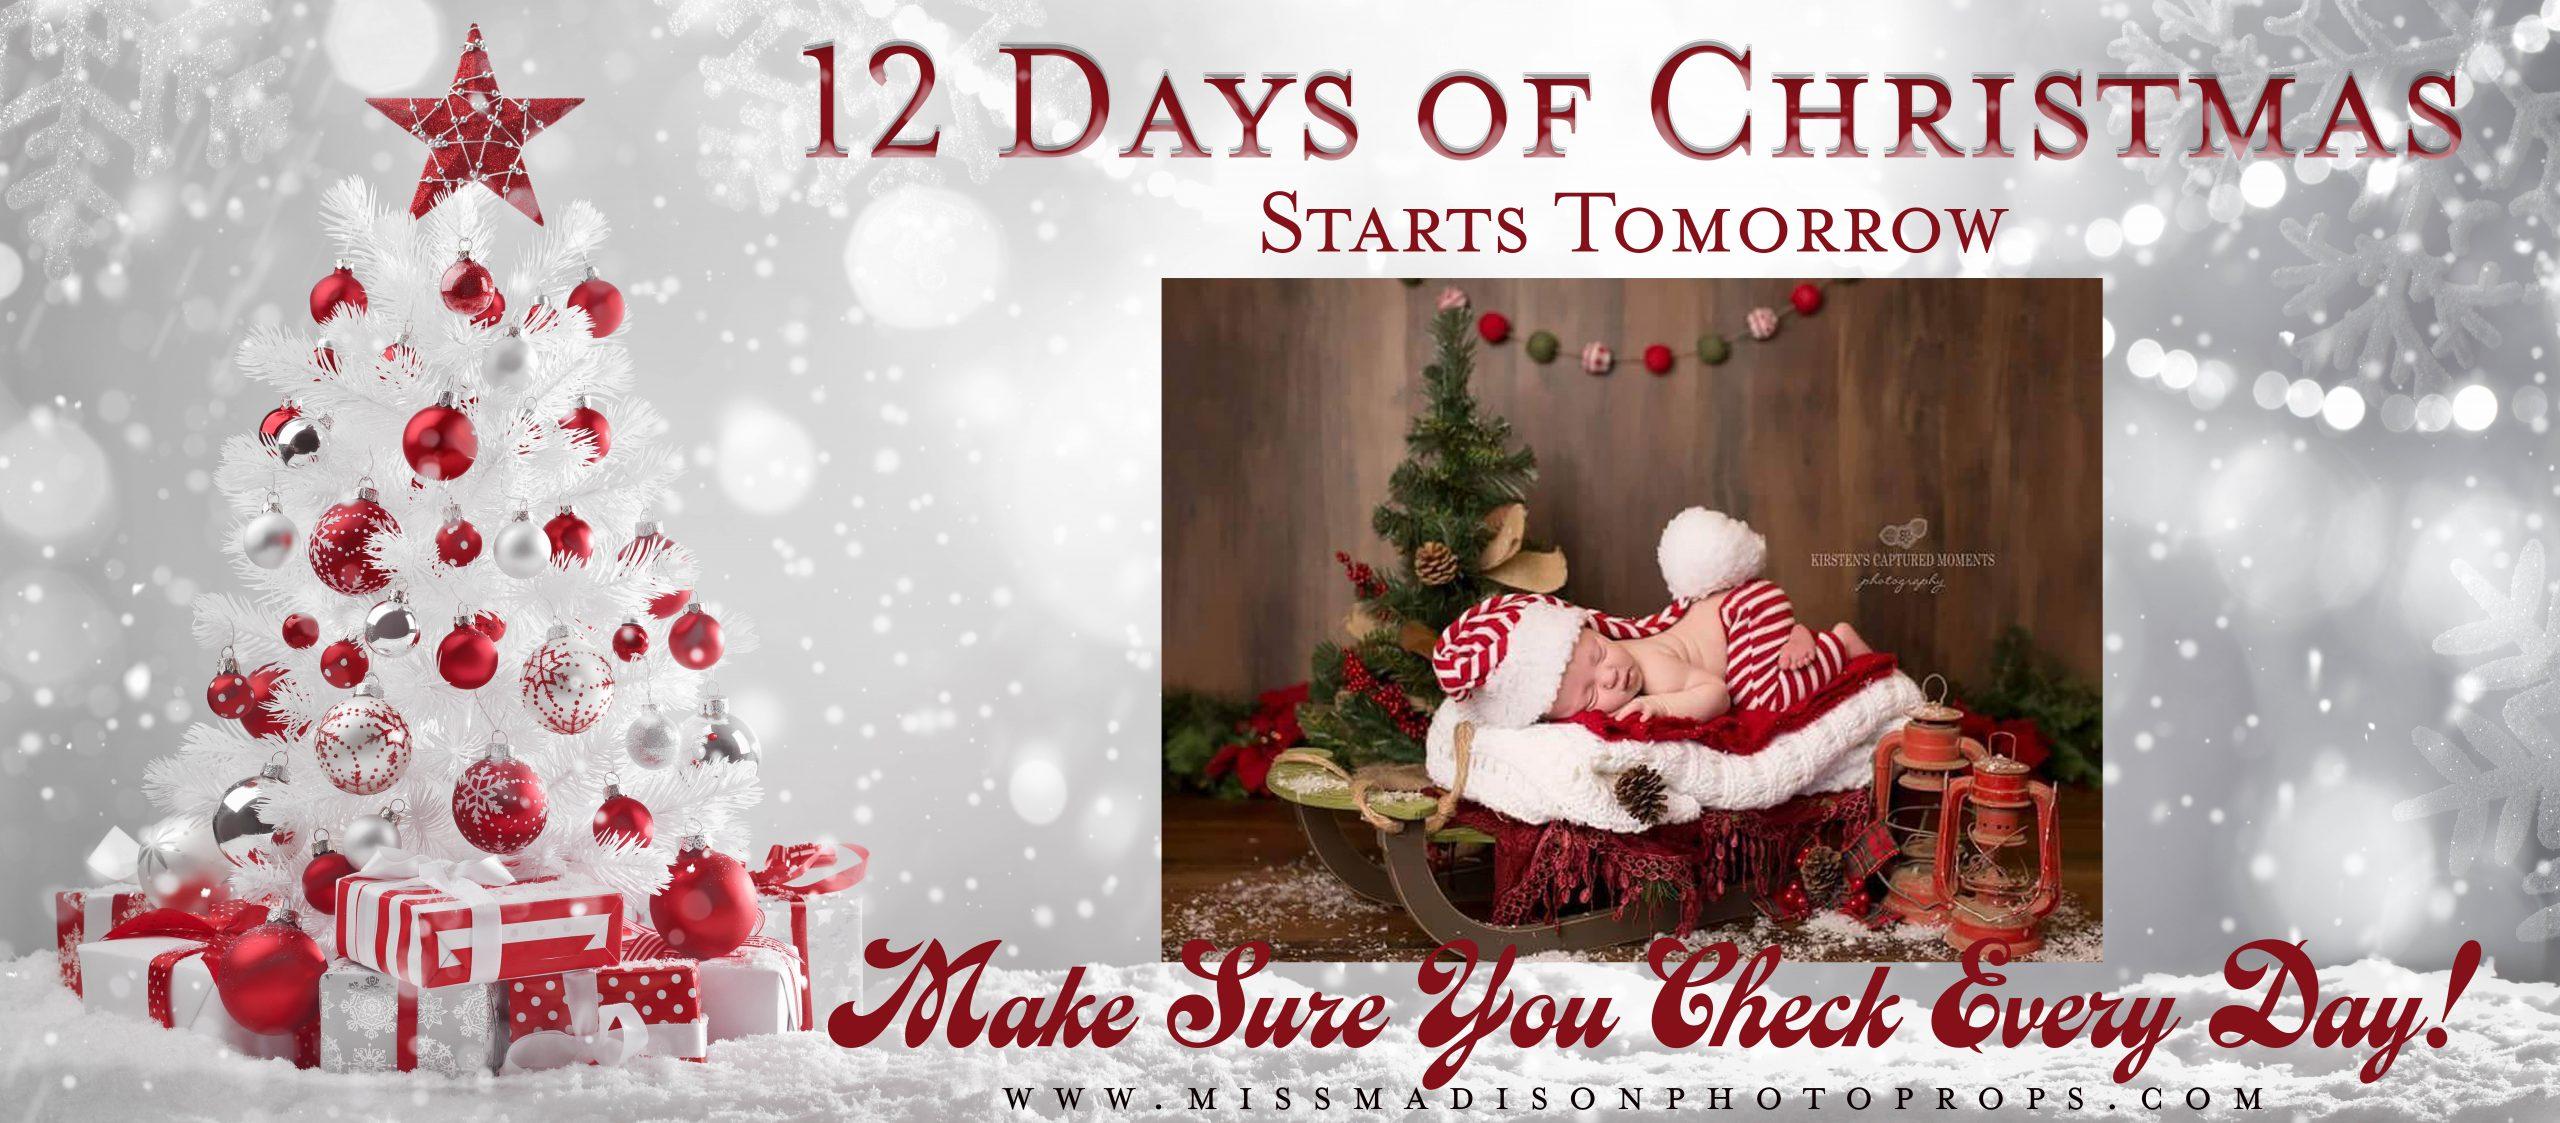 maternity dresses, 12 days of christmas, maternity gown, maternity dress, photography, photoshoot, babyshower dress, bridesmaid dress